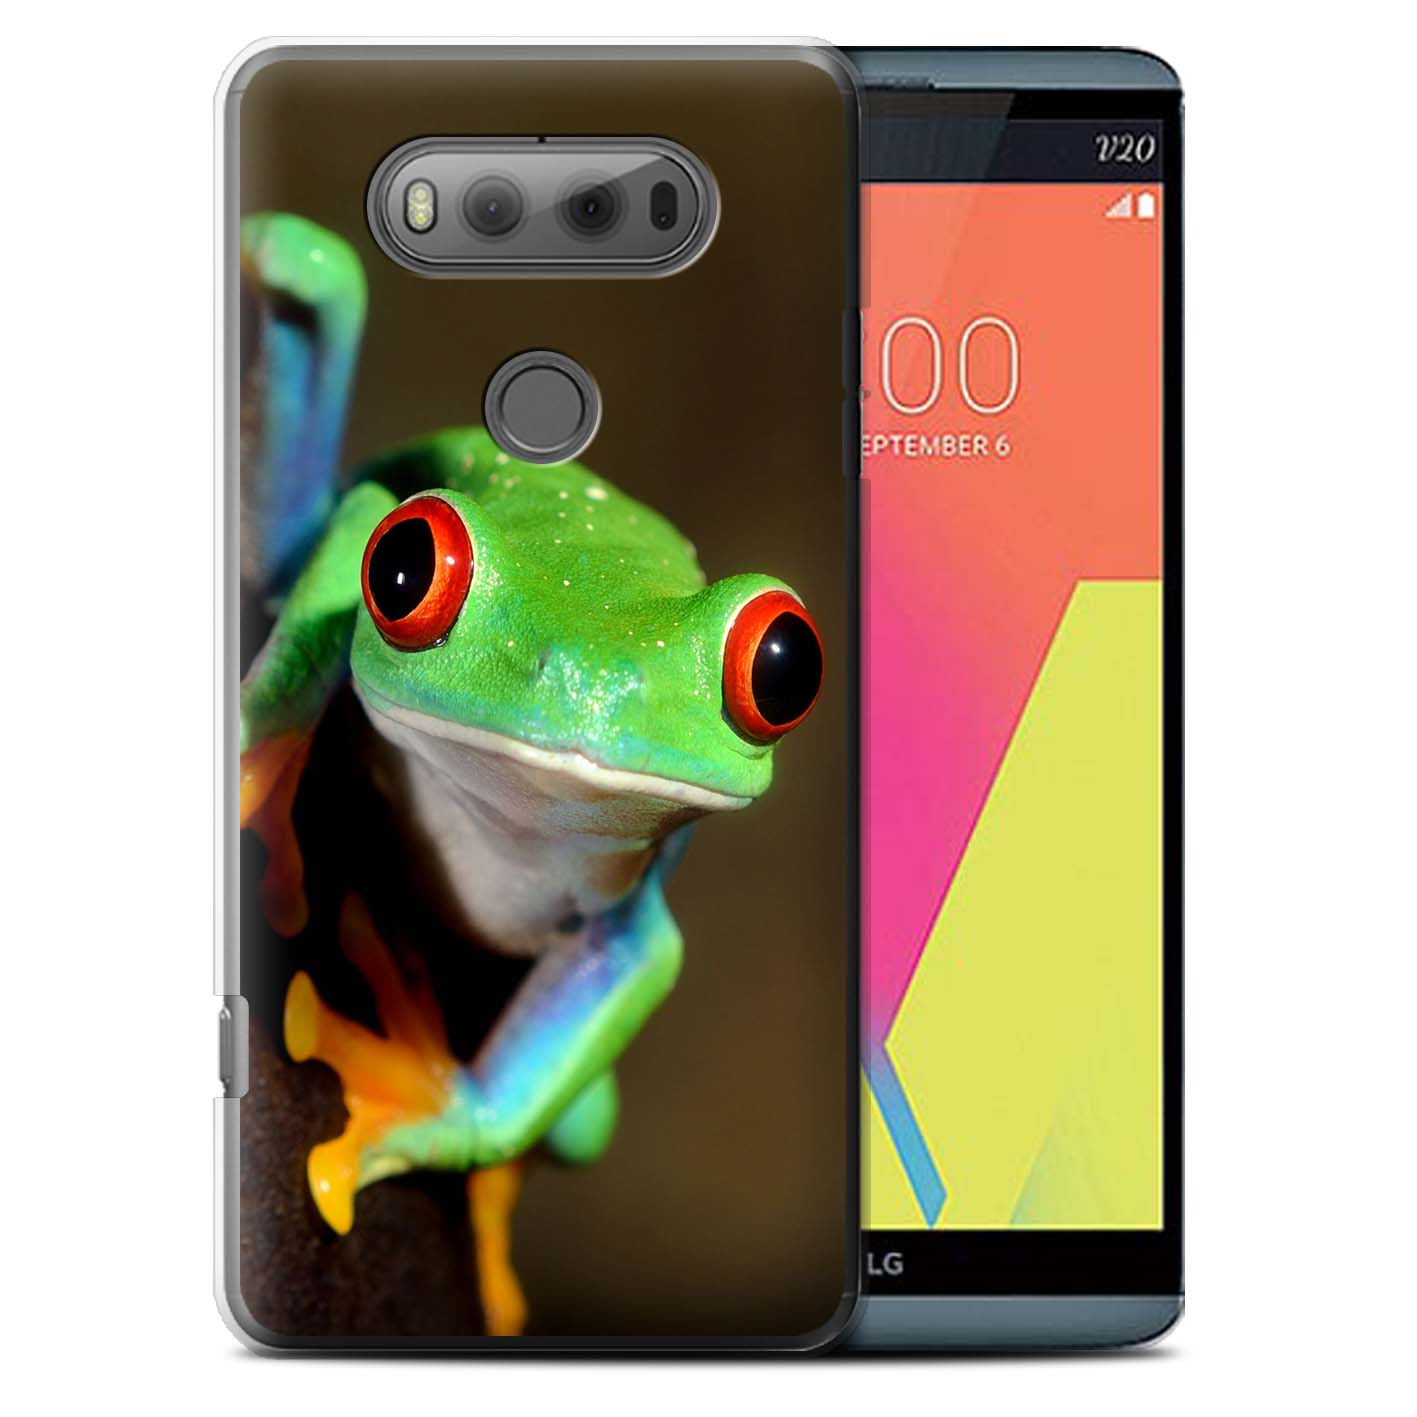 STUFF4 Back Case/Cover/Skin for LG V20 F800/H990/VS995/Wildlife Animals